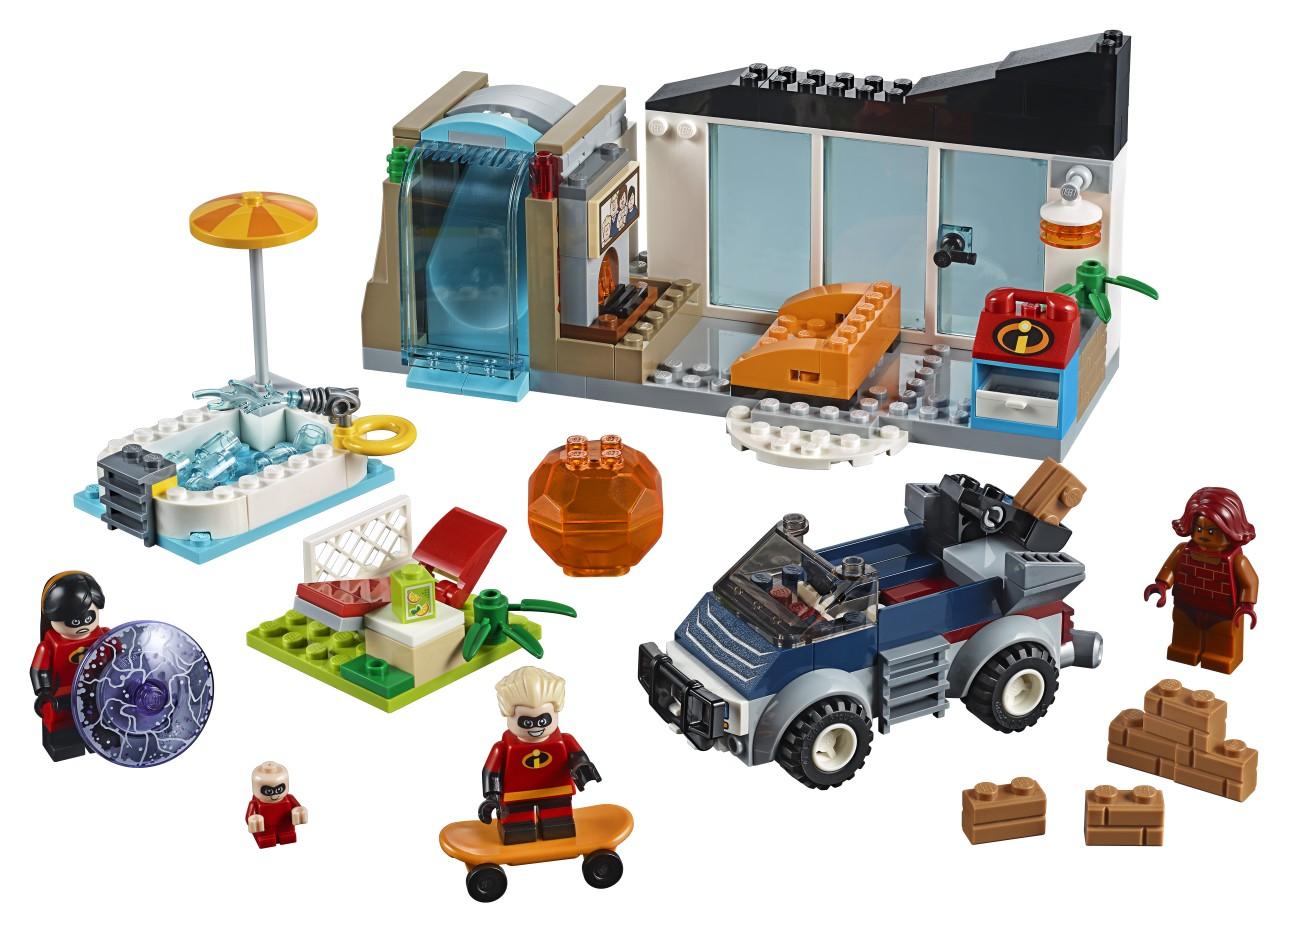 LEGO Juniors - Incredibles 2 - 10761 The Great Home Escape - Set Accessories